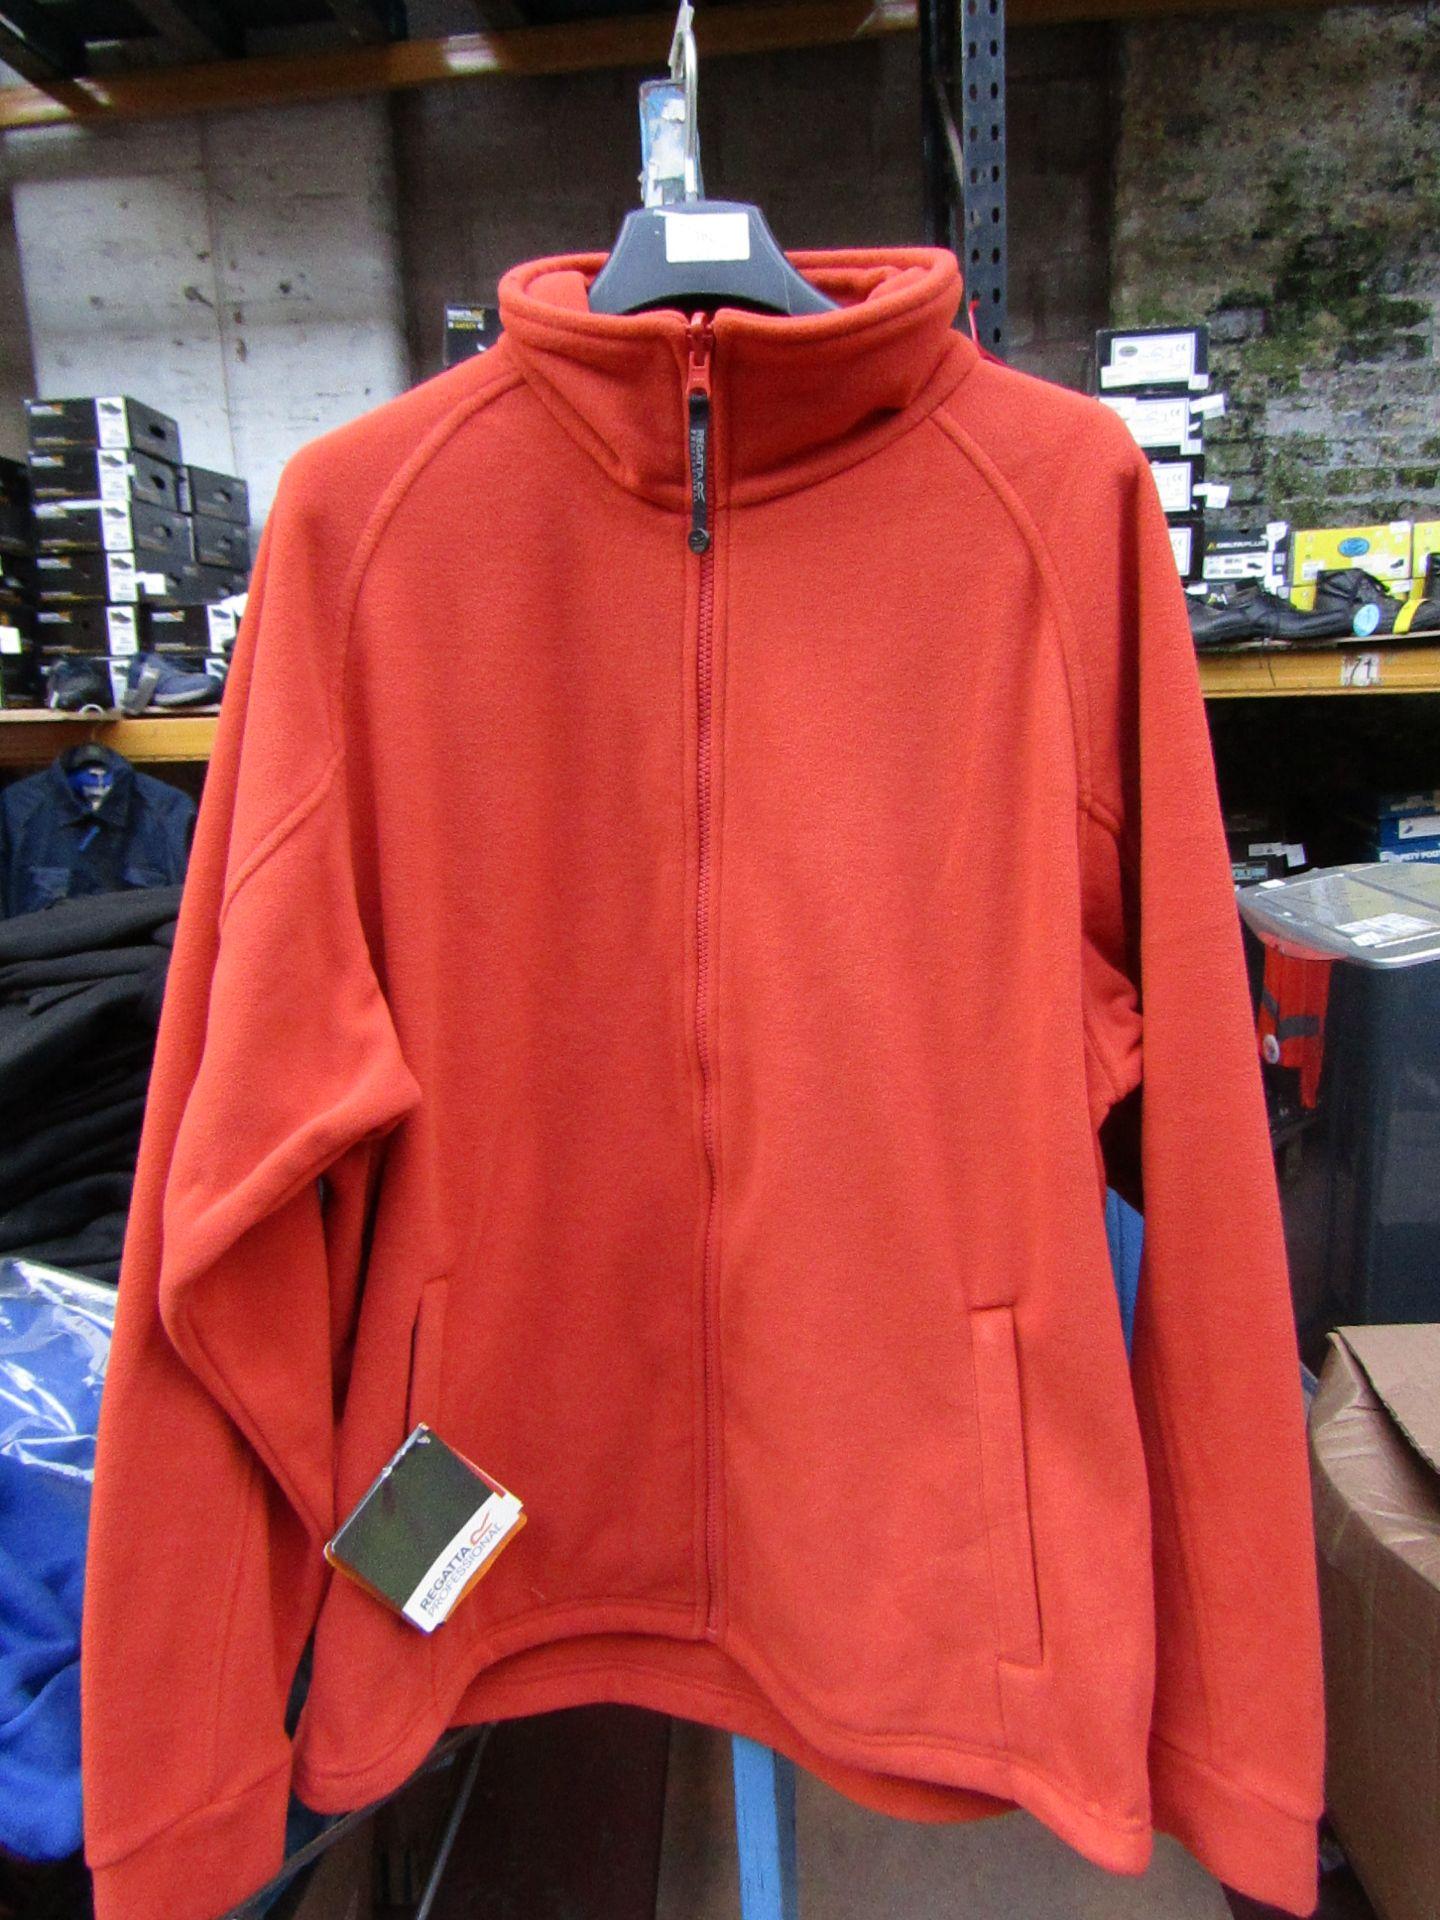 Lot 52 - Men's Regatta Professional Fleece Oxford Firebrick. Size M. new in Packaging